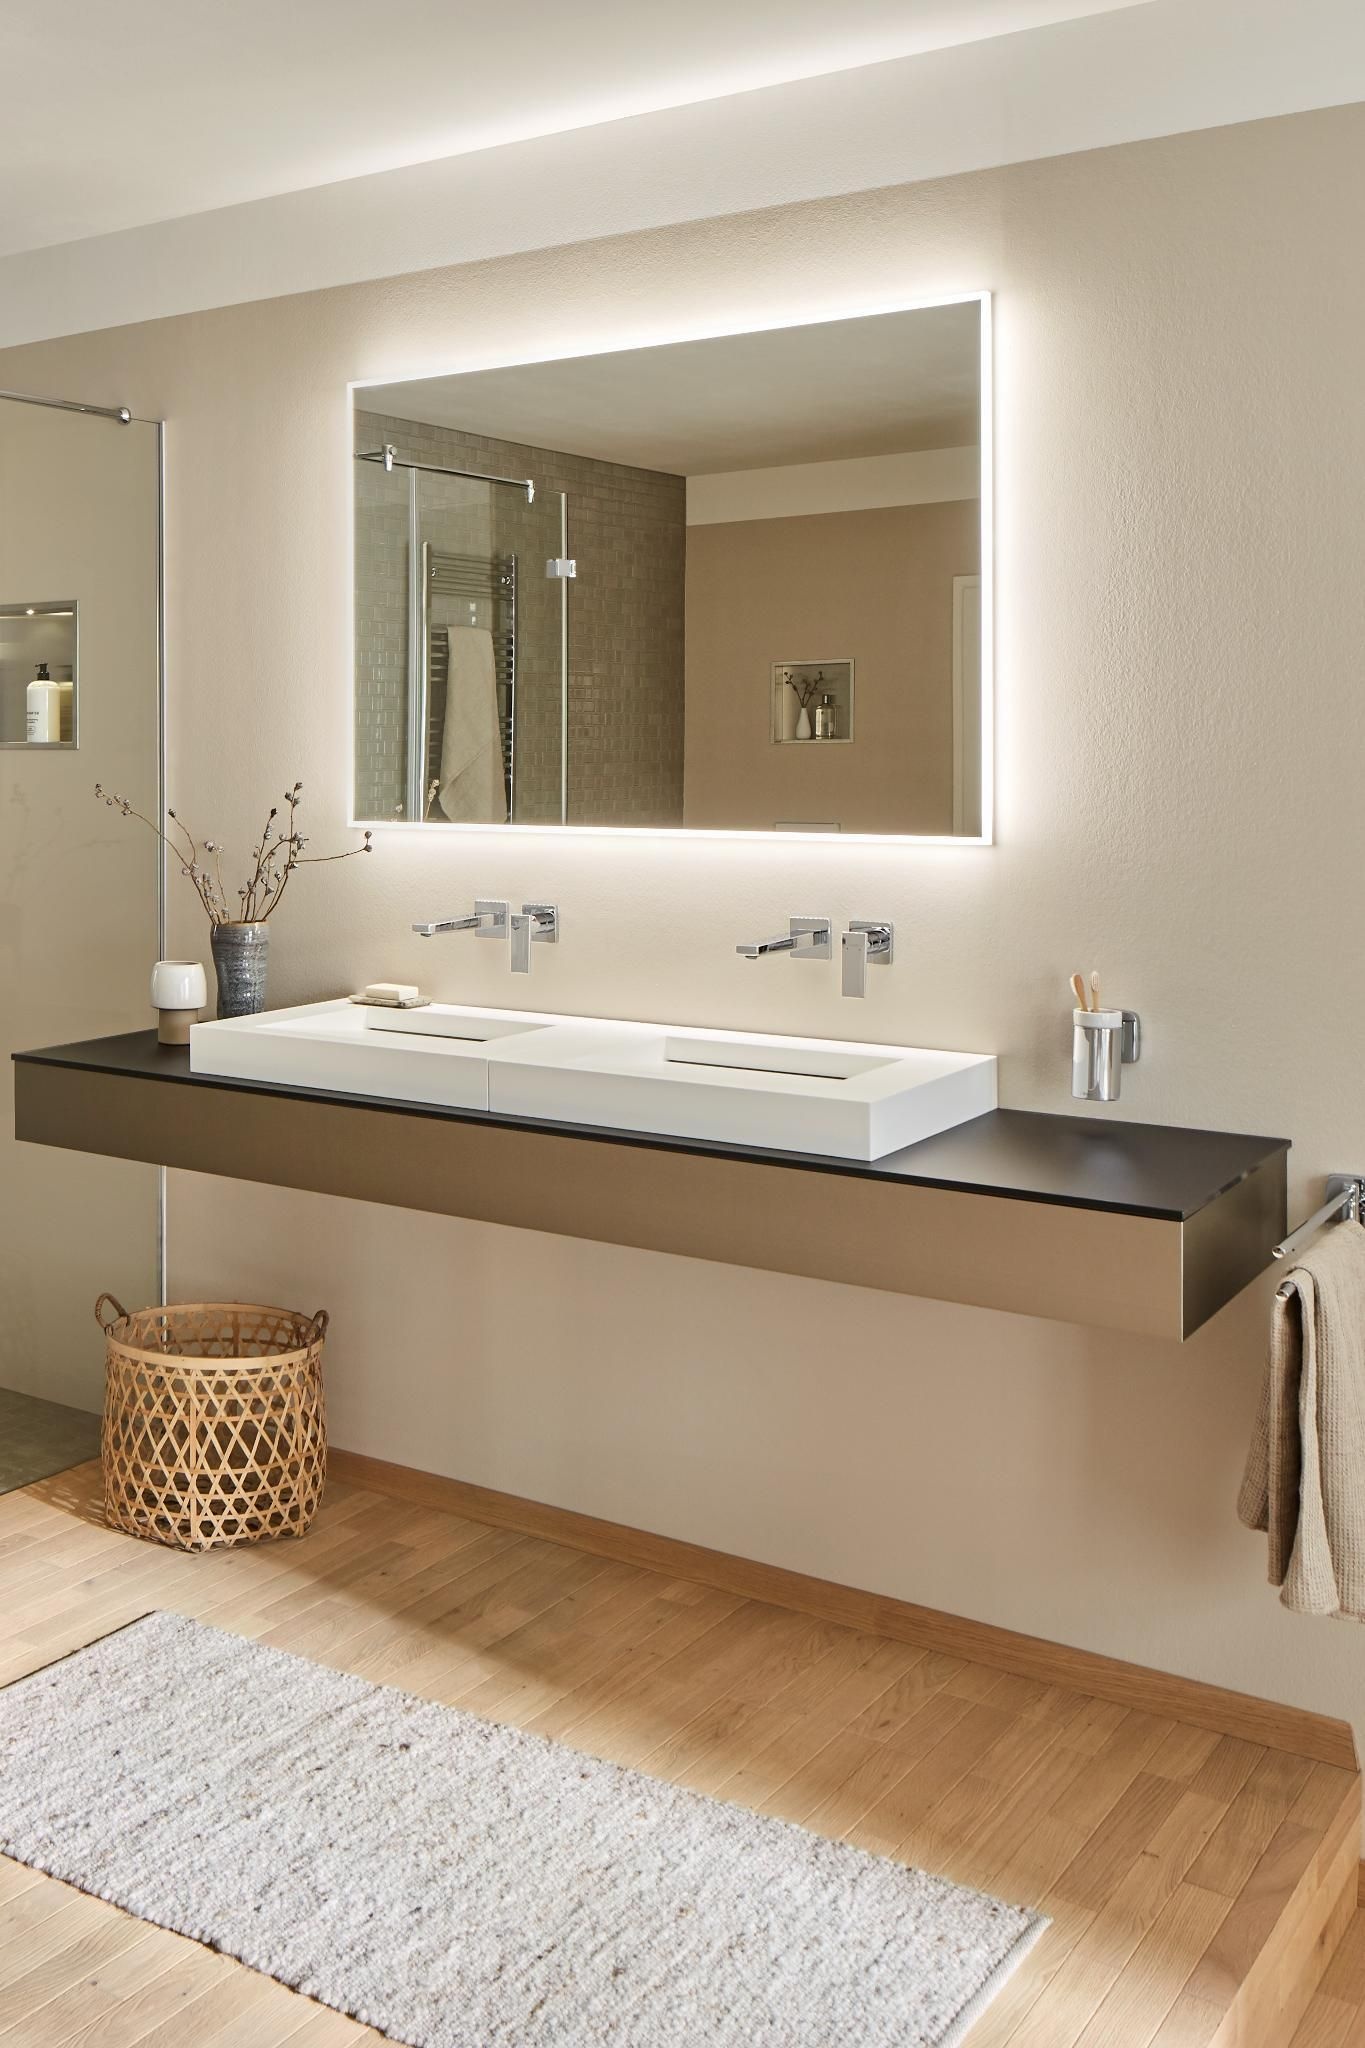 Warm Colors Bathroom Ideas Hansgrohe Modern Bathroom Plan Bathroom Interior Bathroom Faucets